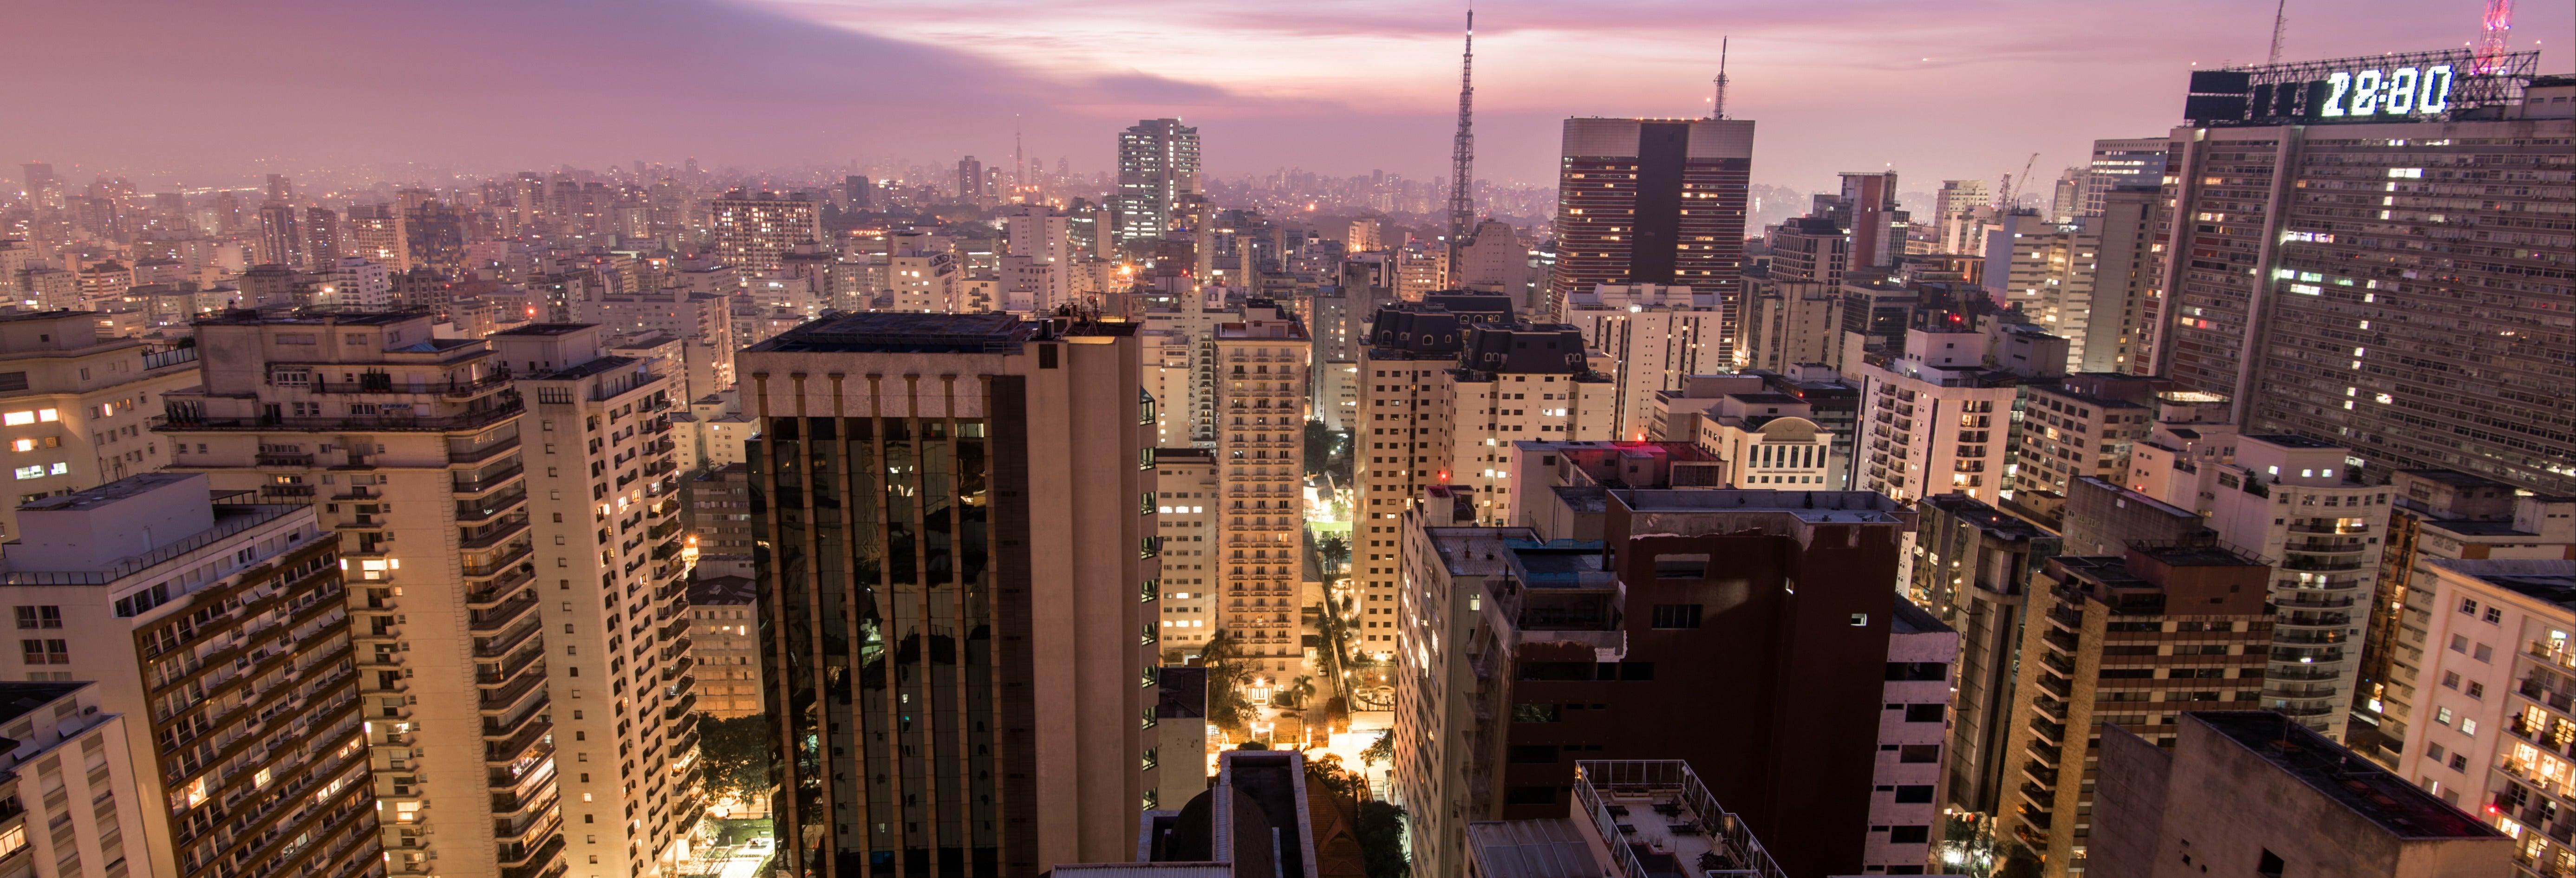 Tour nocturno por Sao Paulo